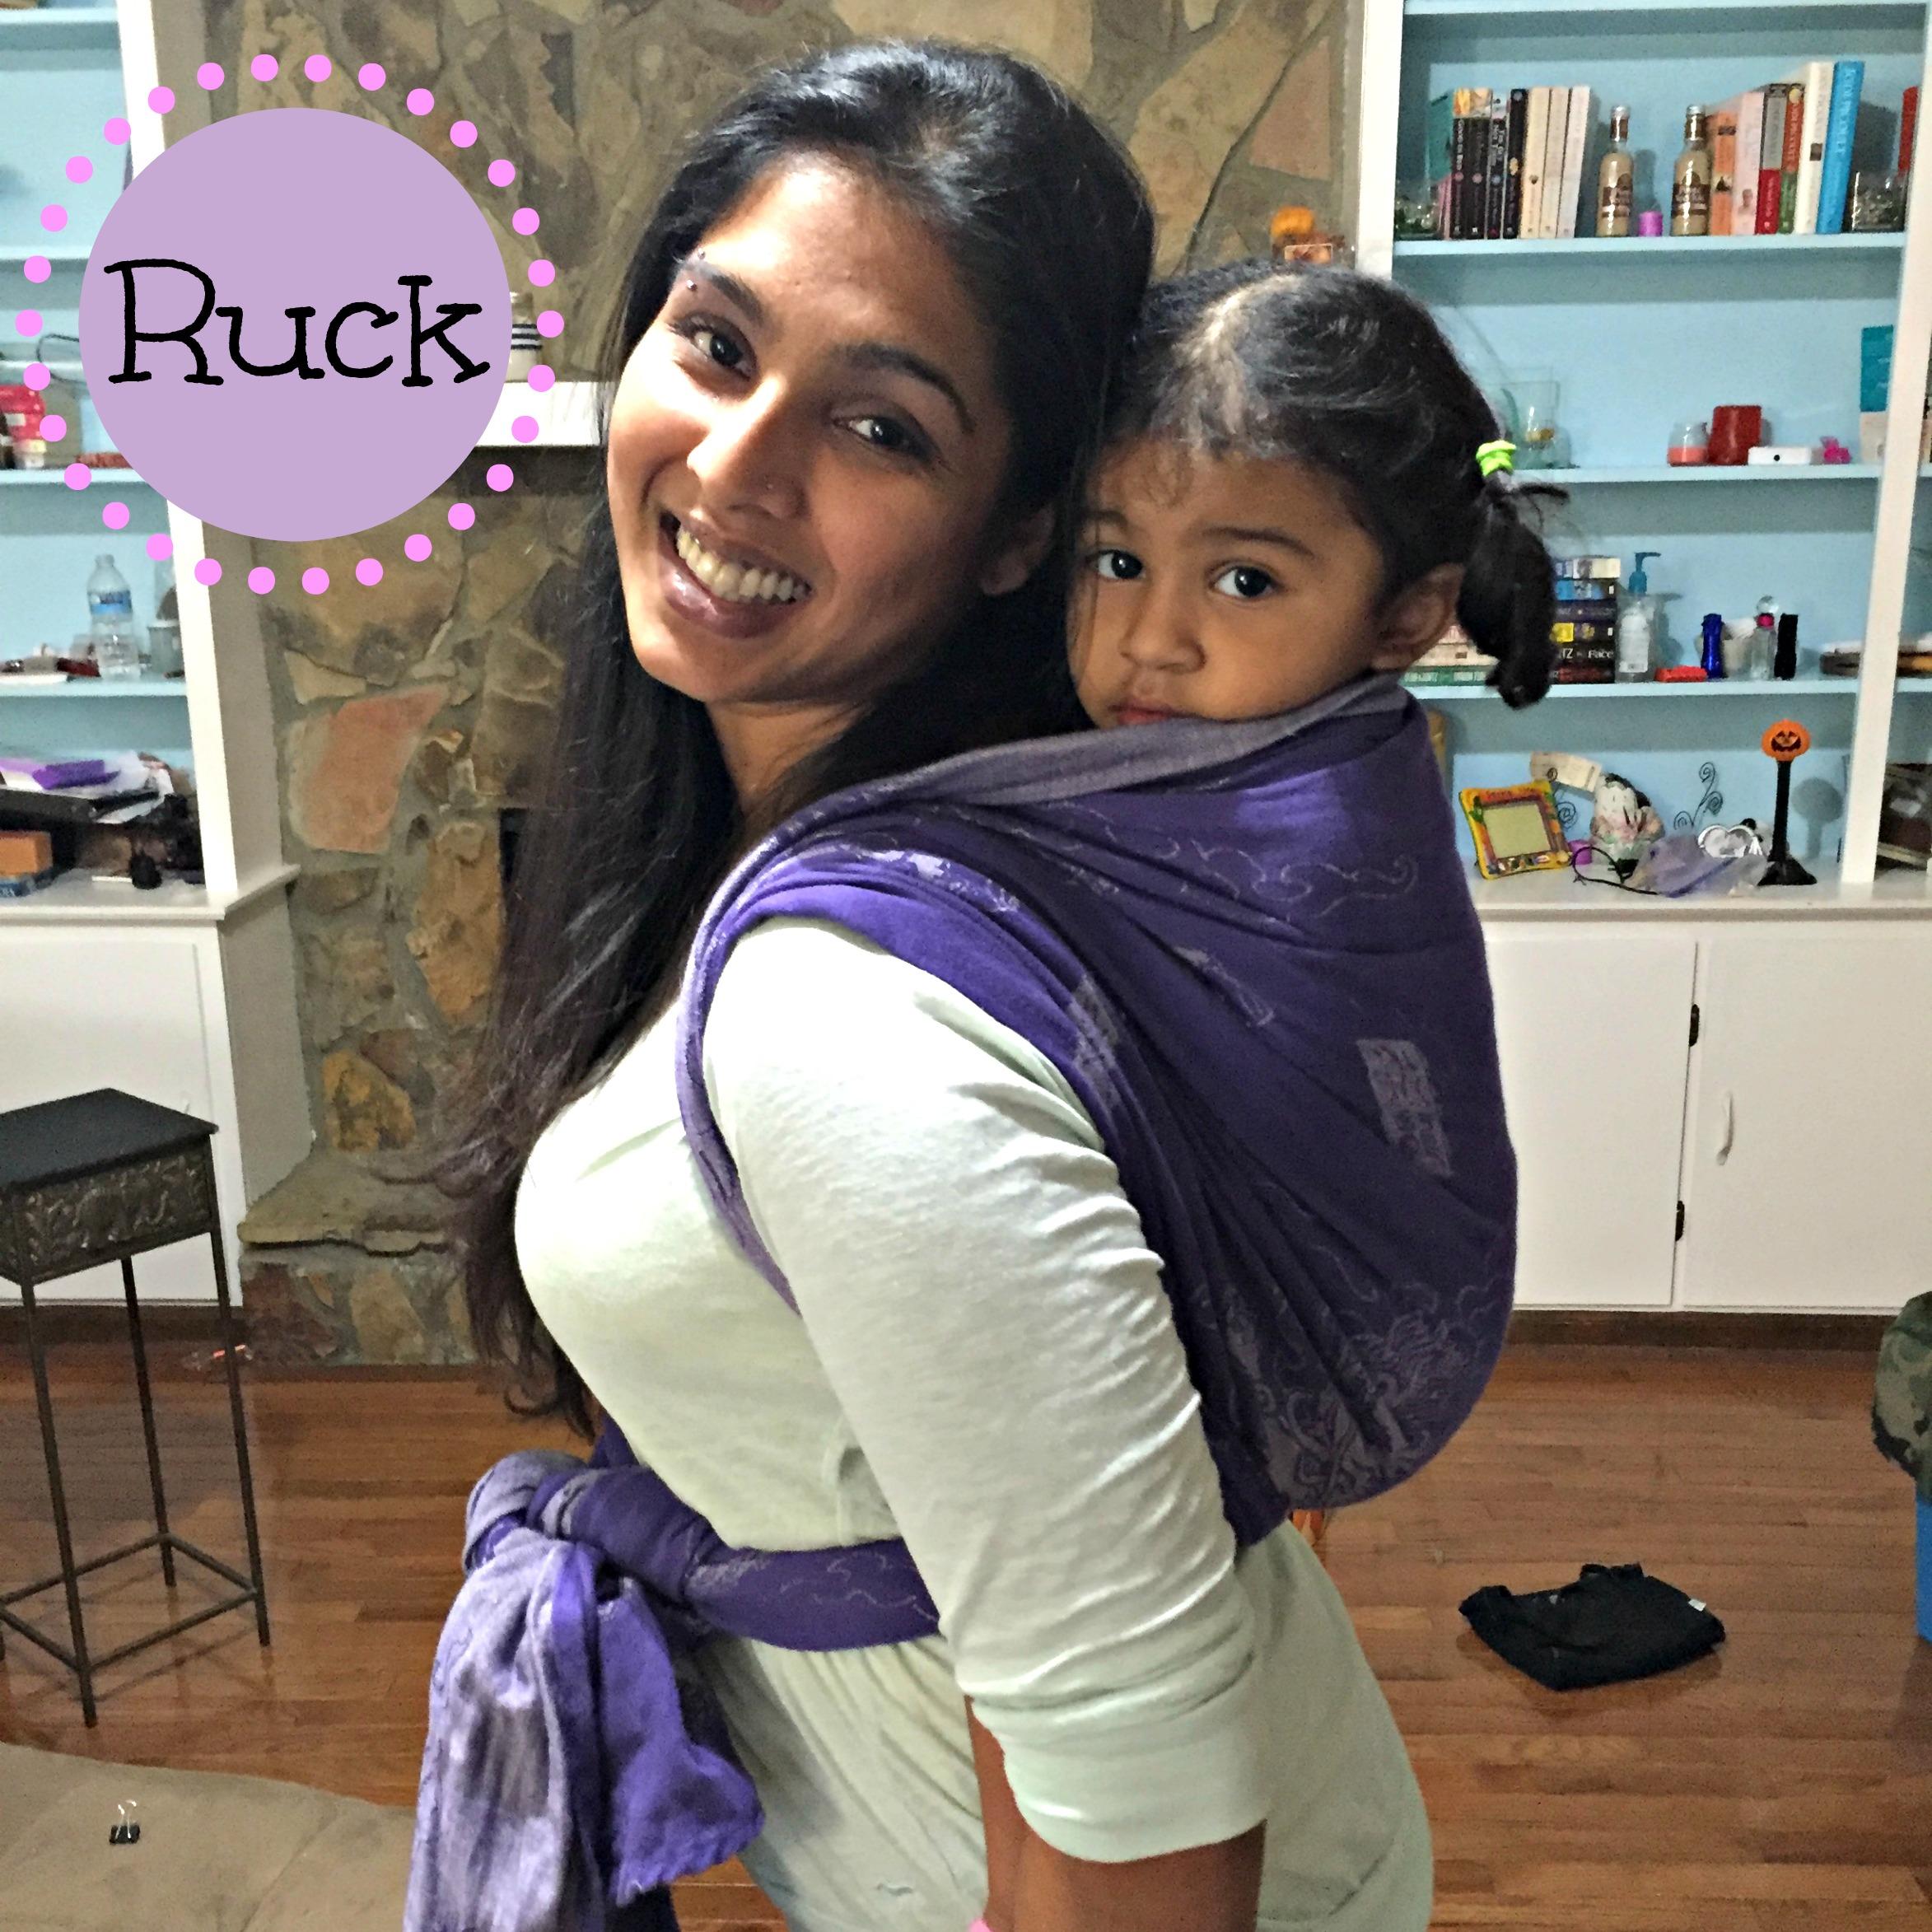 ruck feat image.jpg